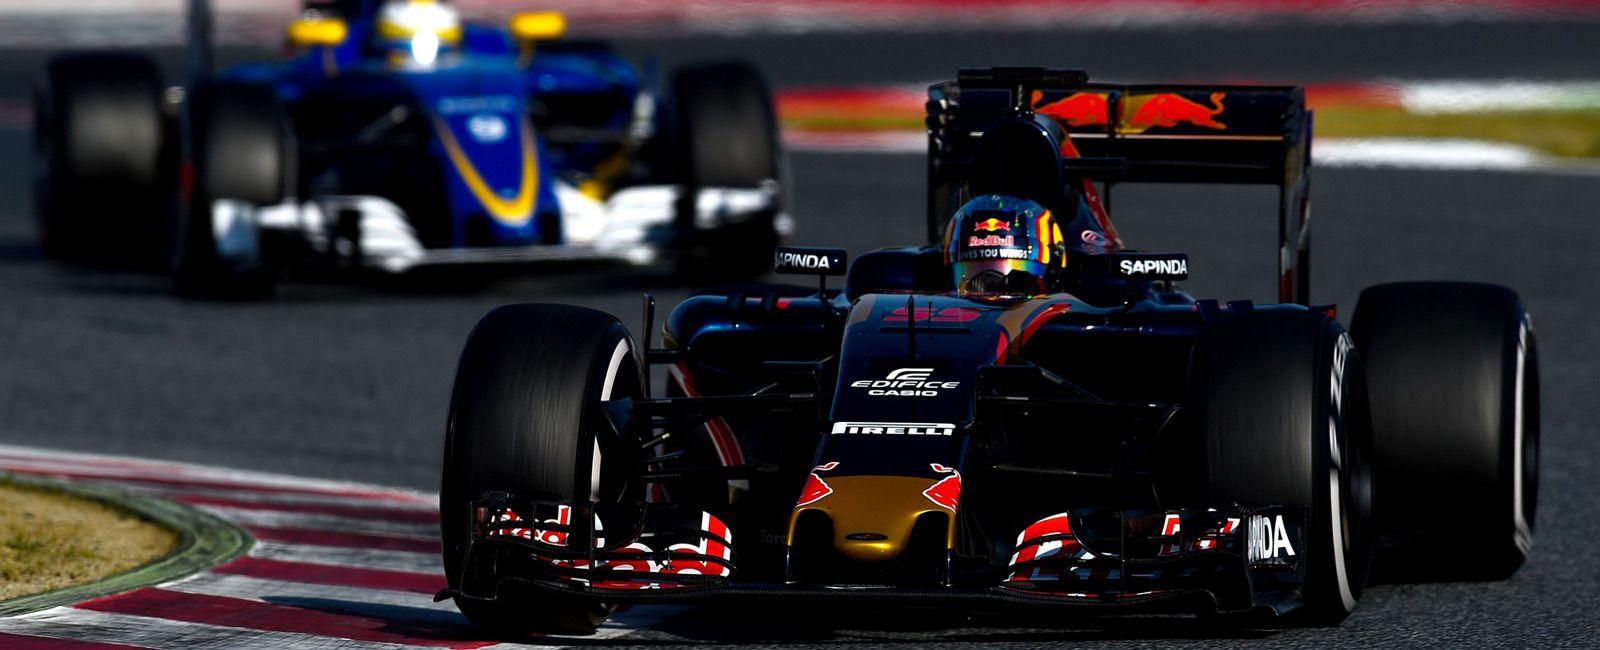 F1-Update-Gear-Patrol-Ambiance-1